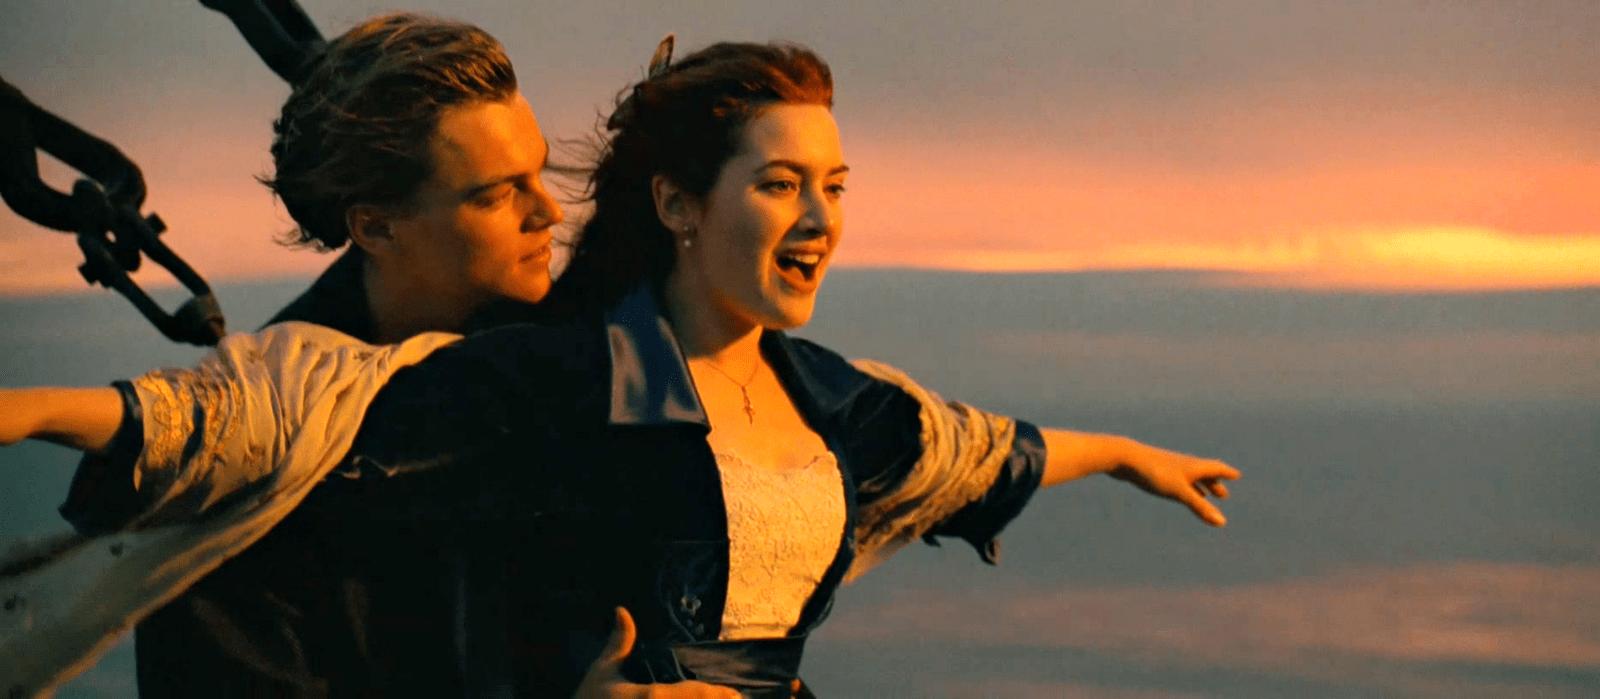 Jack e Rose vs. Leo e Kate: due destini incrociati